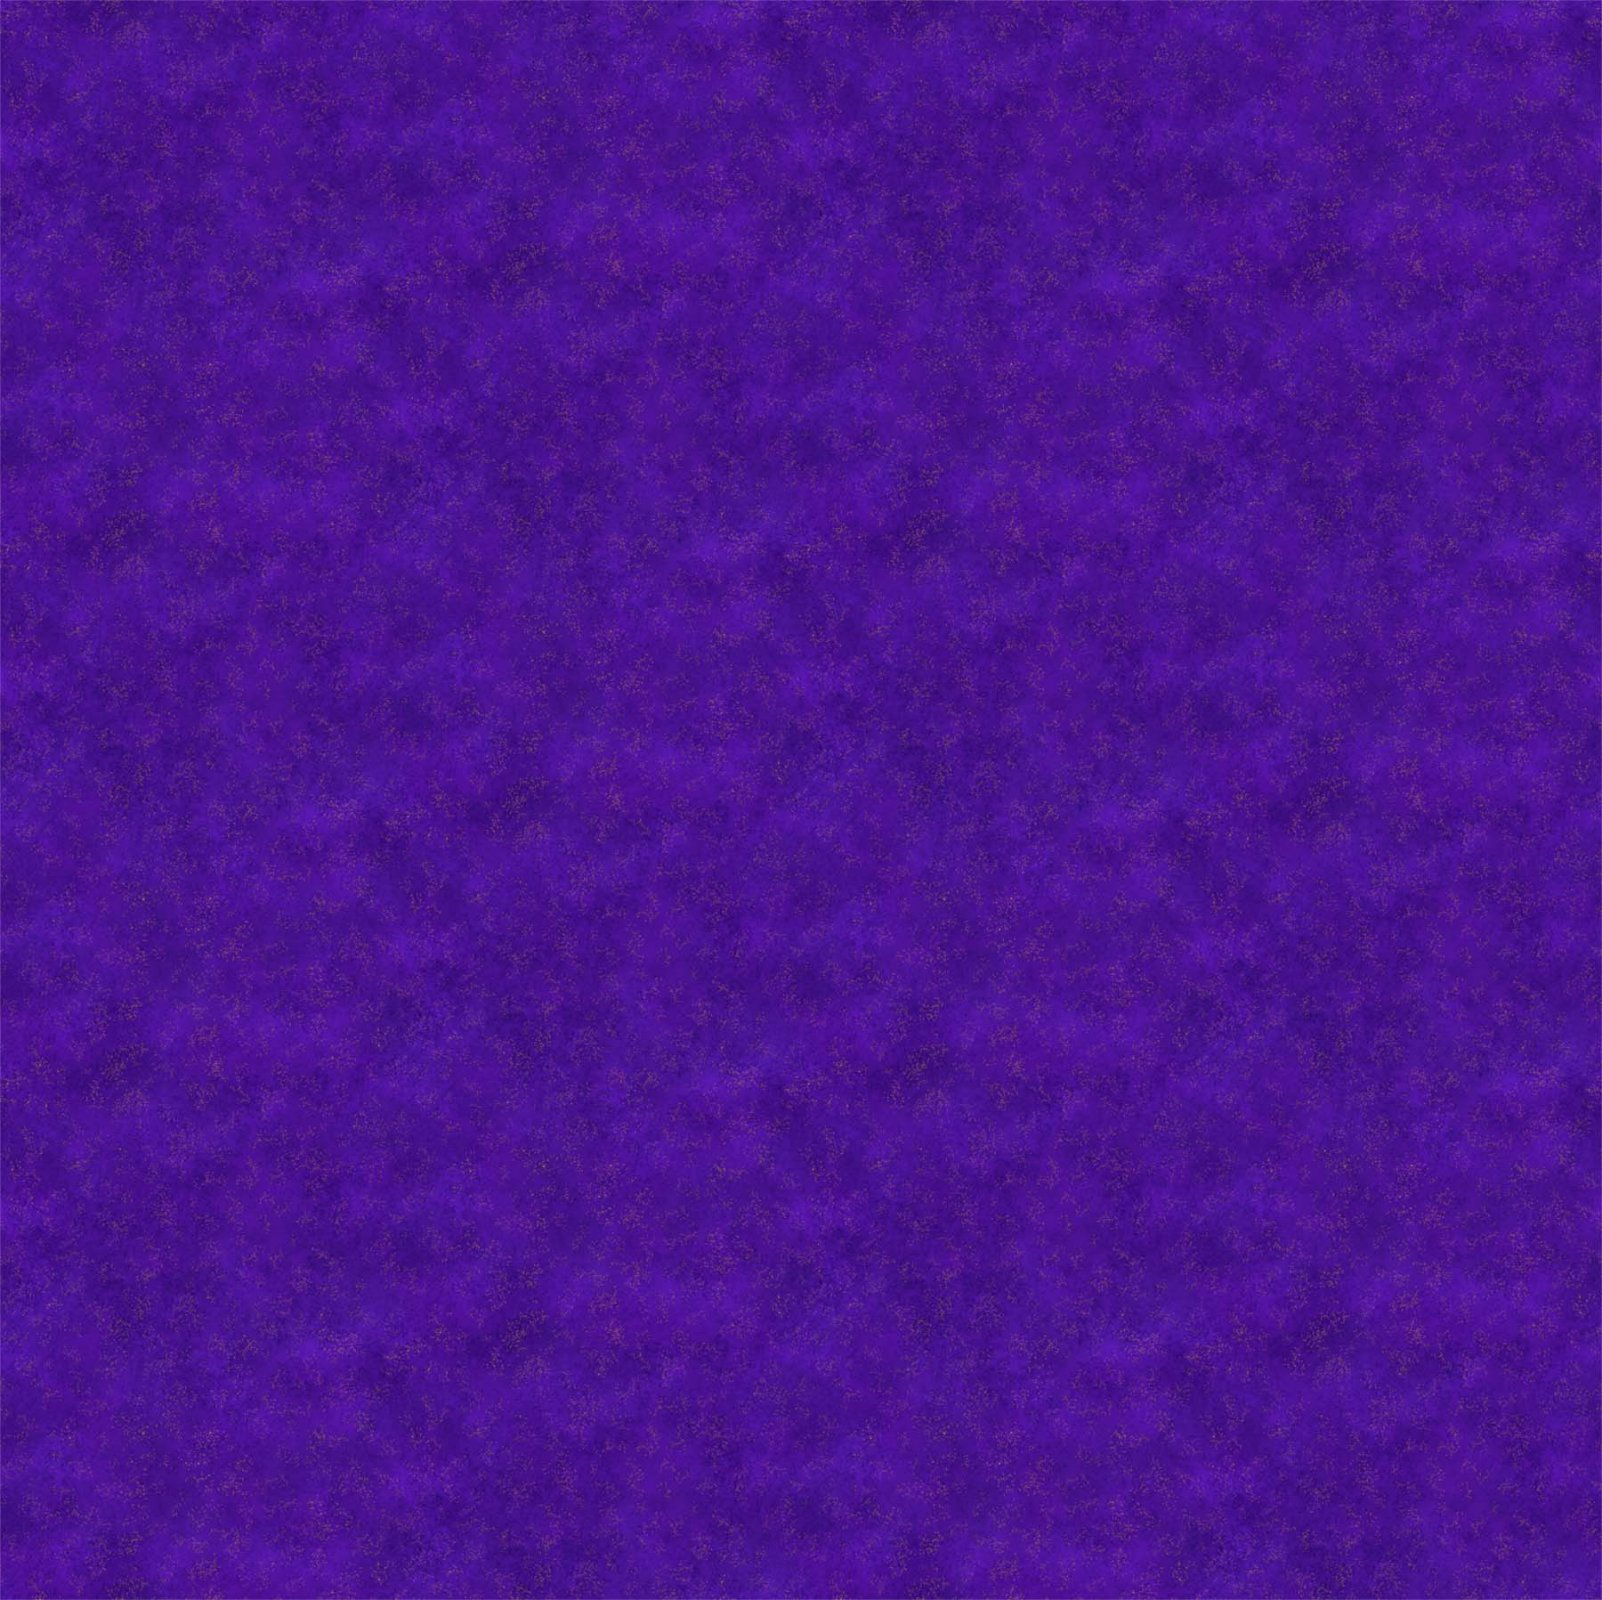 Shimmer - Radiance - Amethyst